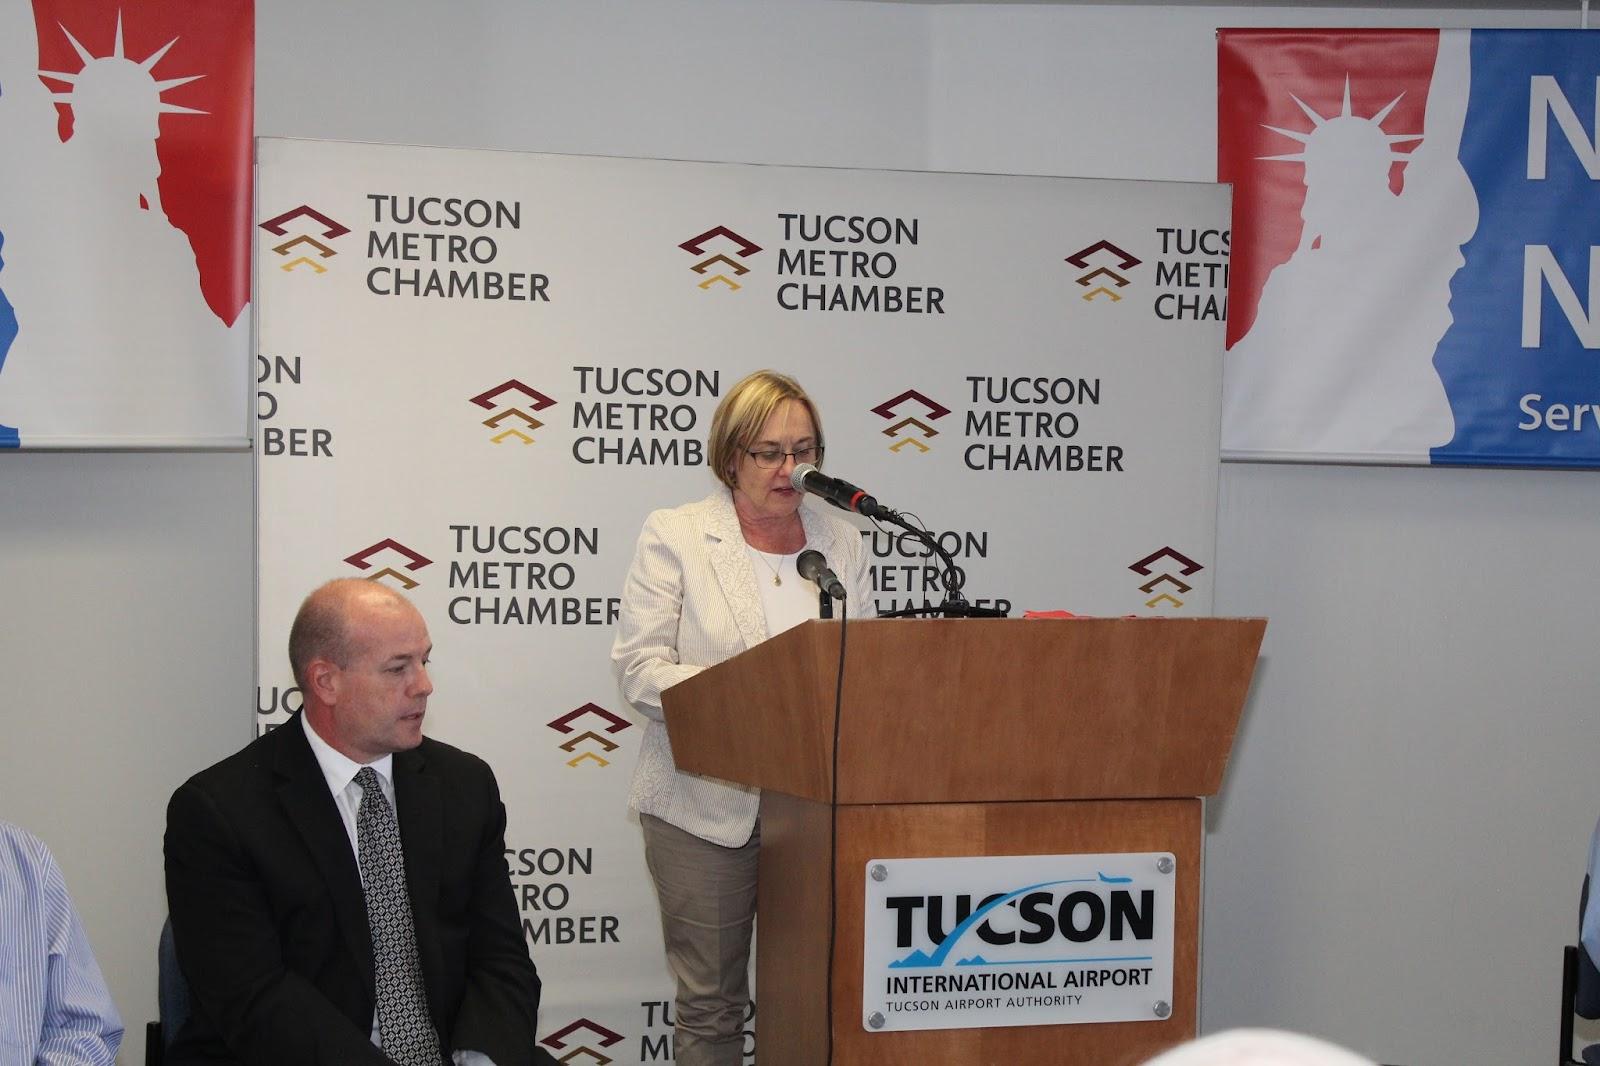 Tucson - JFK Non-Stop Route Announcement - IMG_3218.JPG